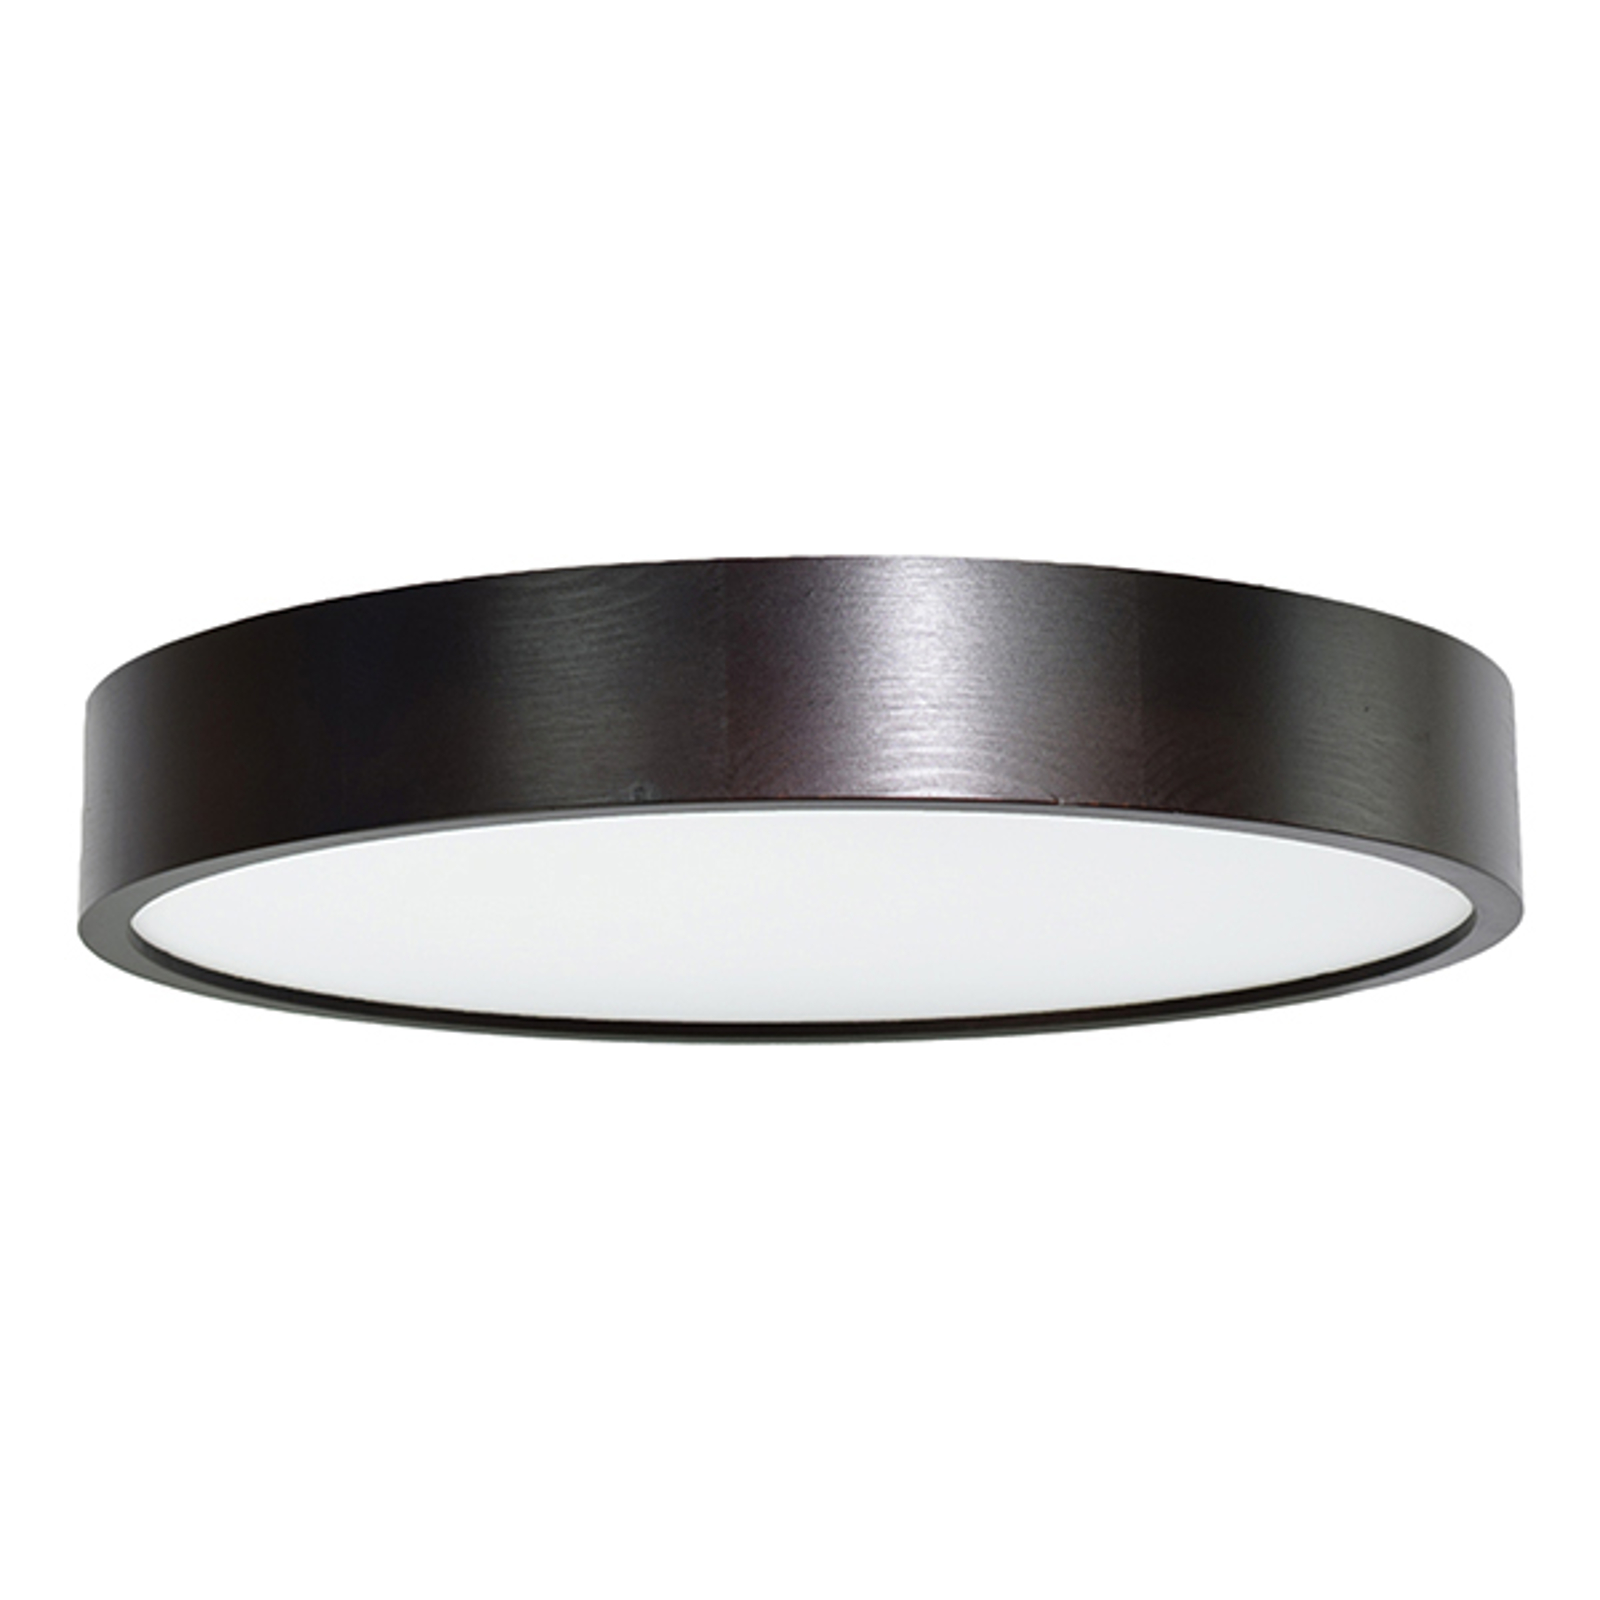 LED-taklampe Cleo, Ø48cm svart